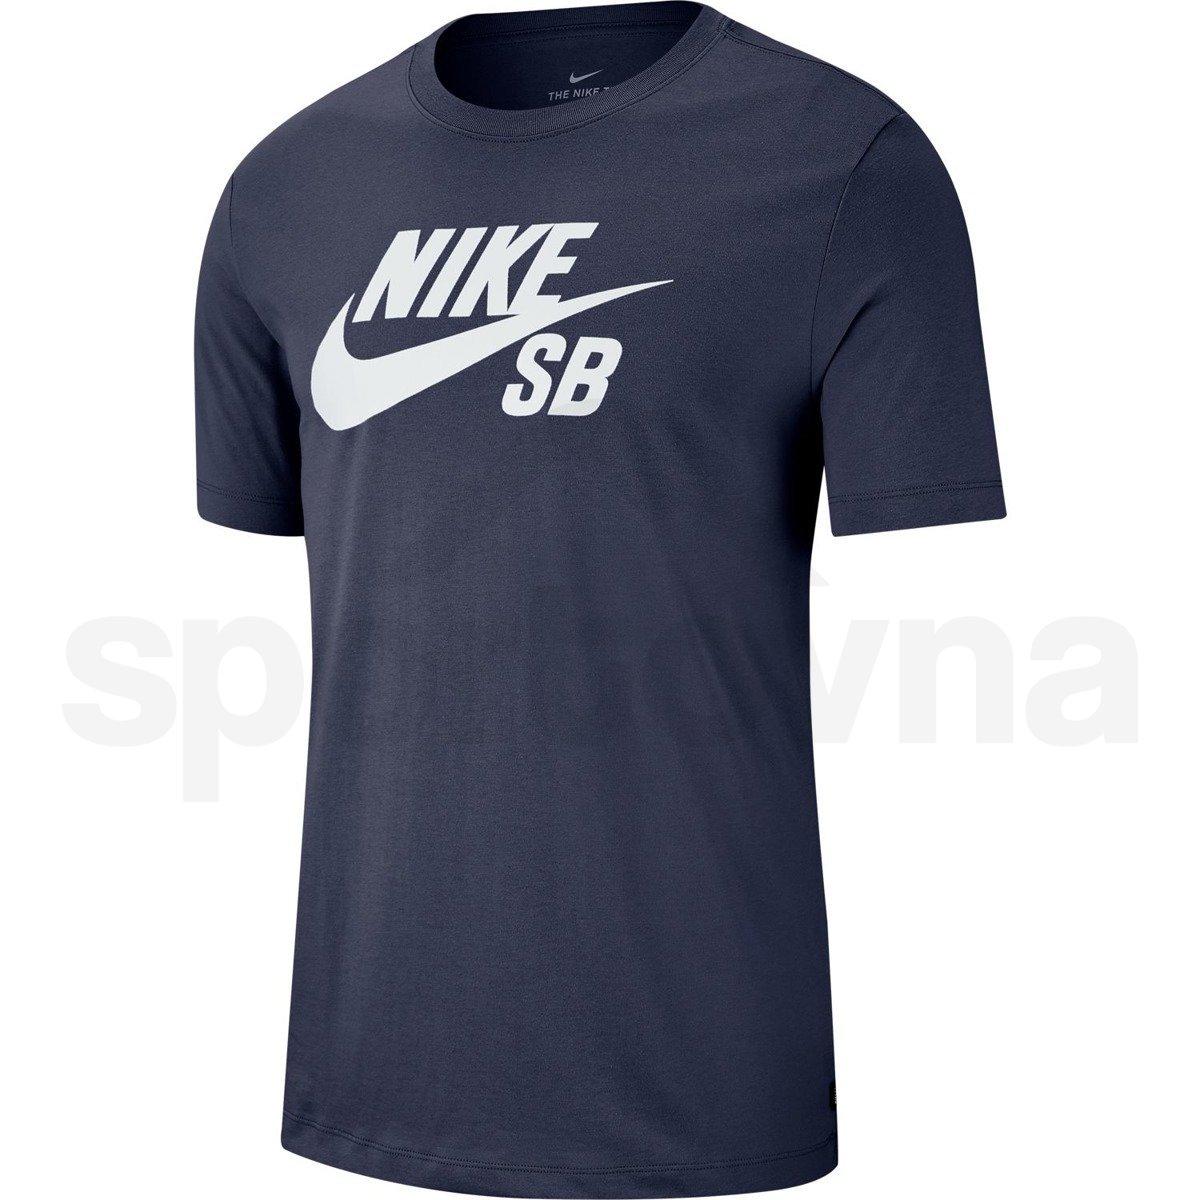 eng_pl_t-shirt-Nike-Sb-Dri-fit-OBSIDIAN-19462_1